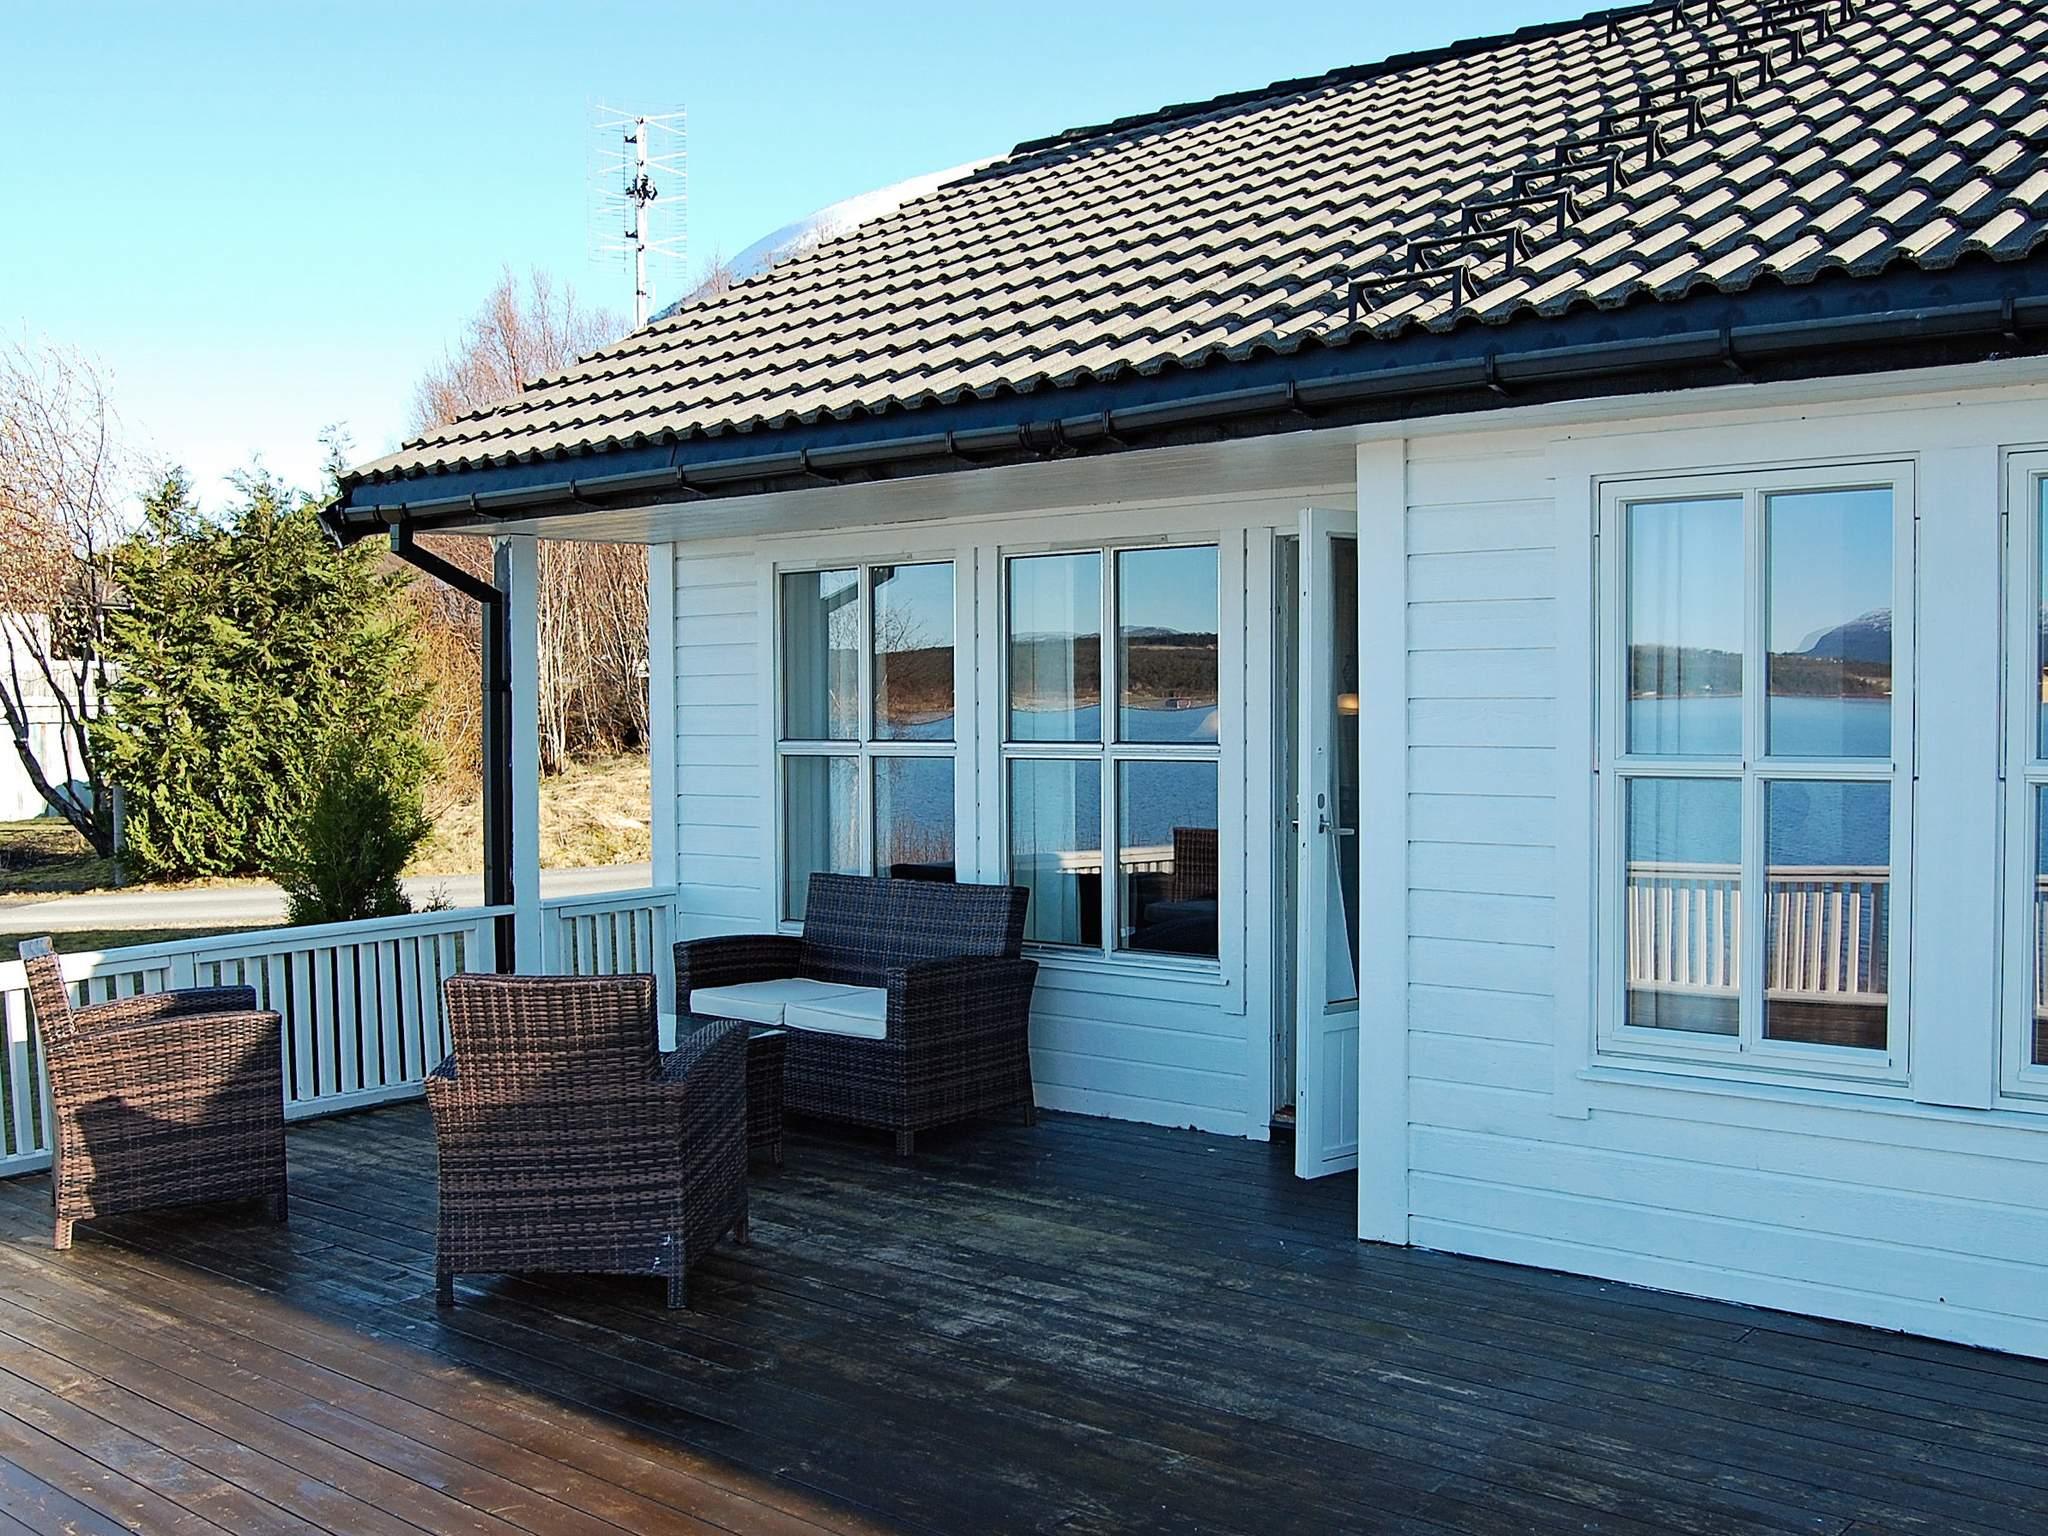 Ferienhaus Vik (1585400), Tomrefjord, More - Romsdal, Westnorwegen, Norwegen, Bild 17